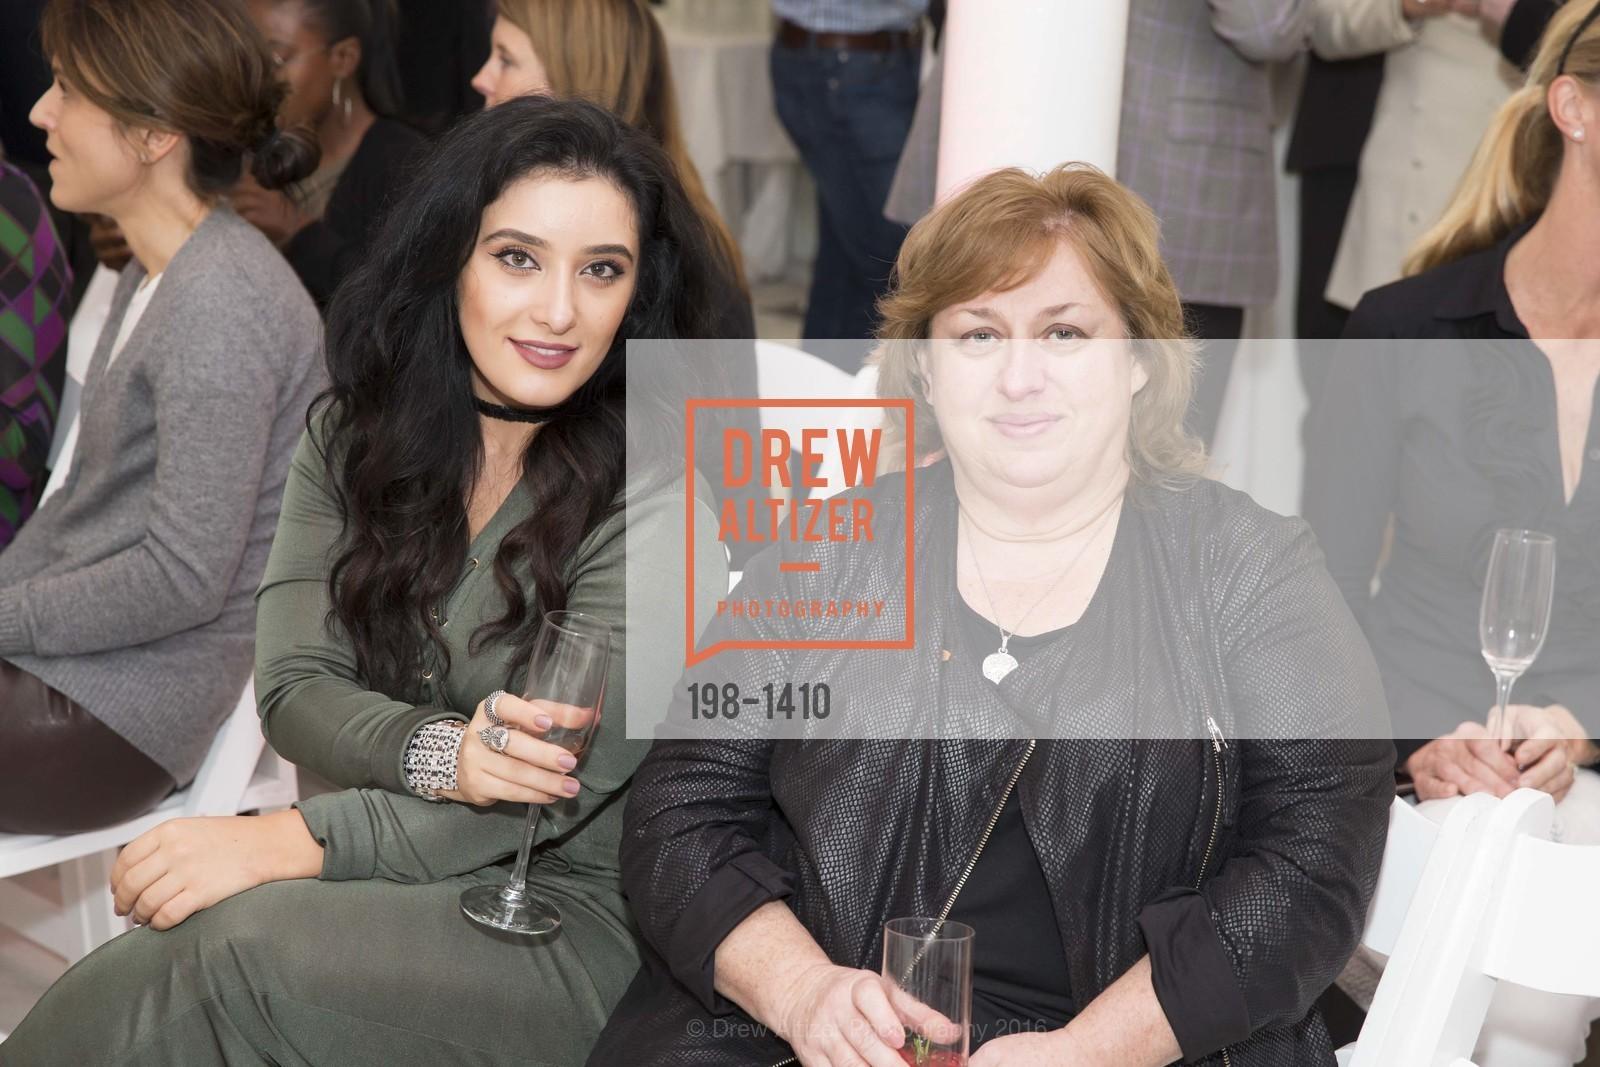 Hermine Mnatsakanian, Esfir Shrayber, Photo #198-1410